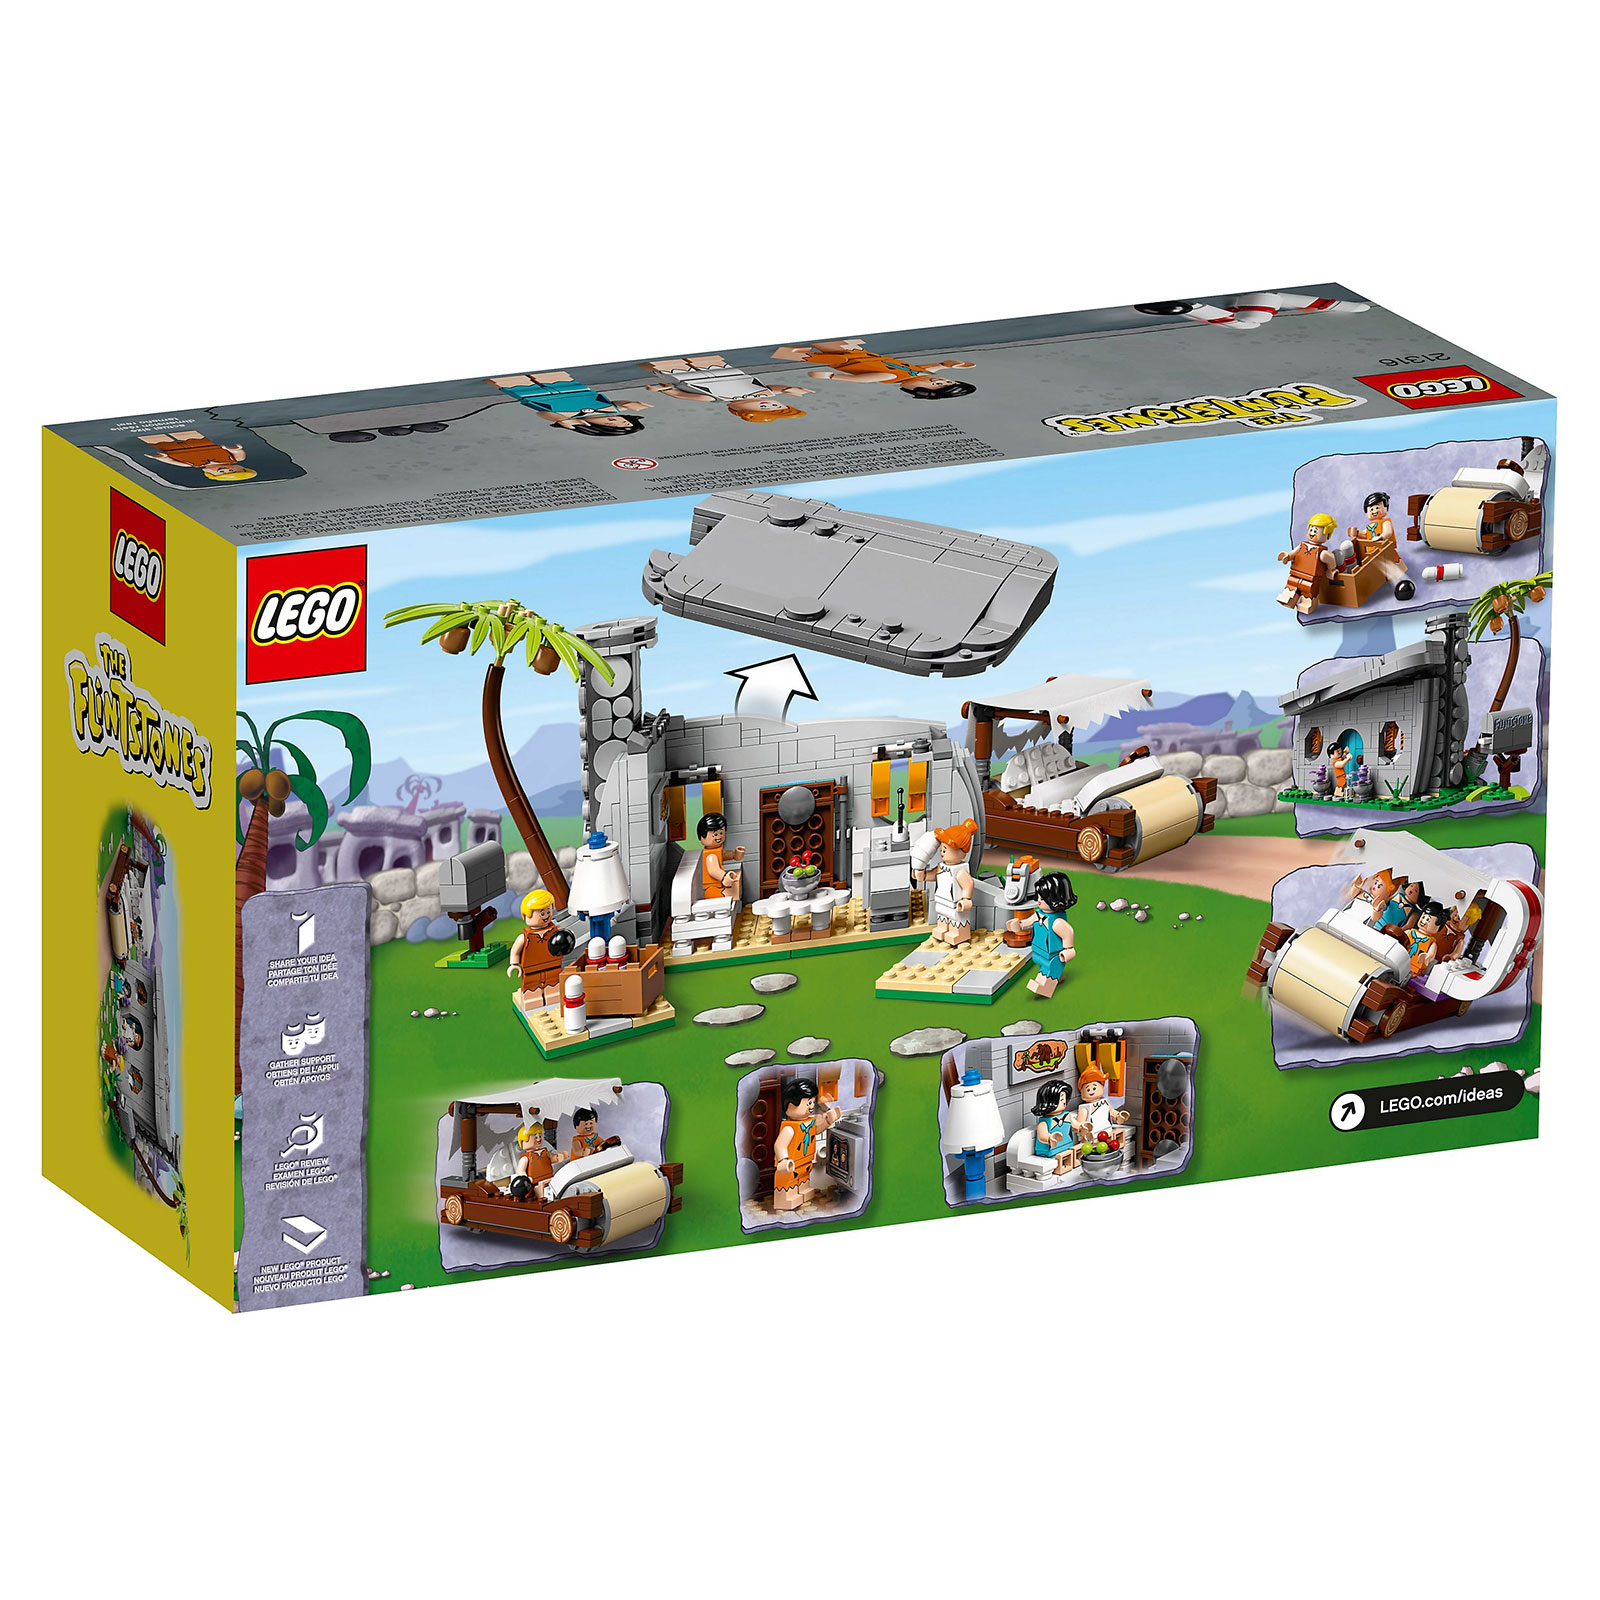 LEGO IDEAS The Flintstones #21316